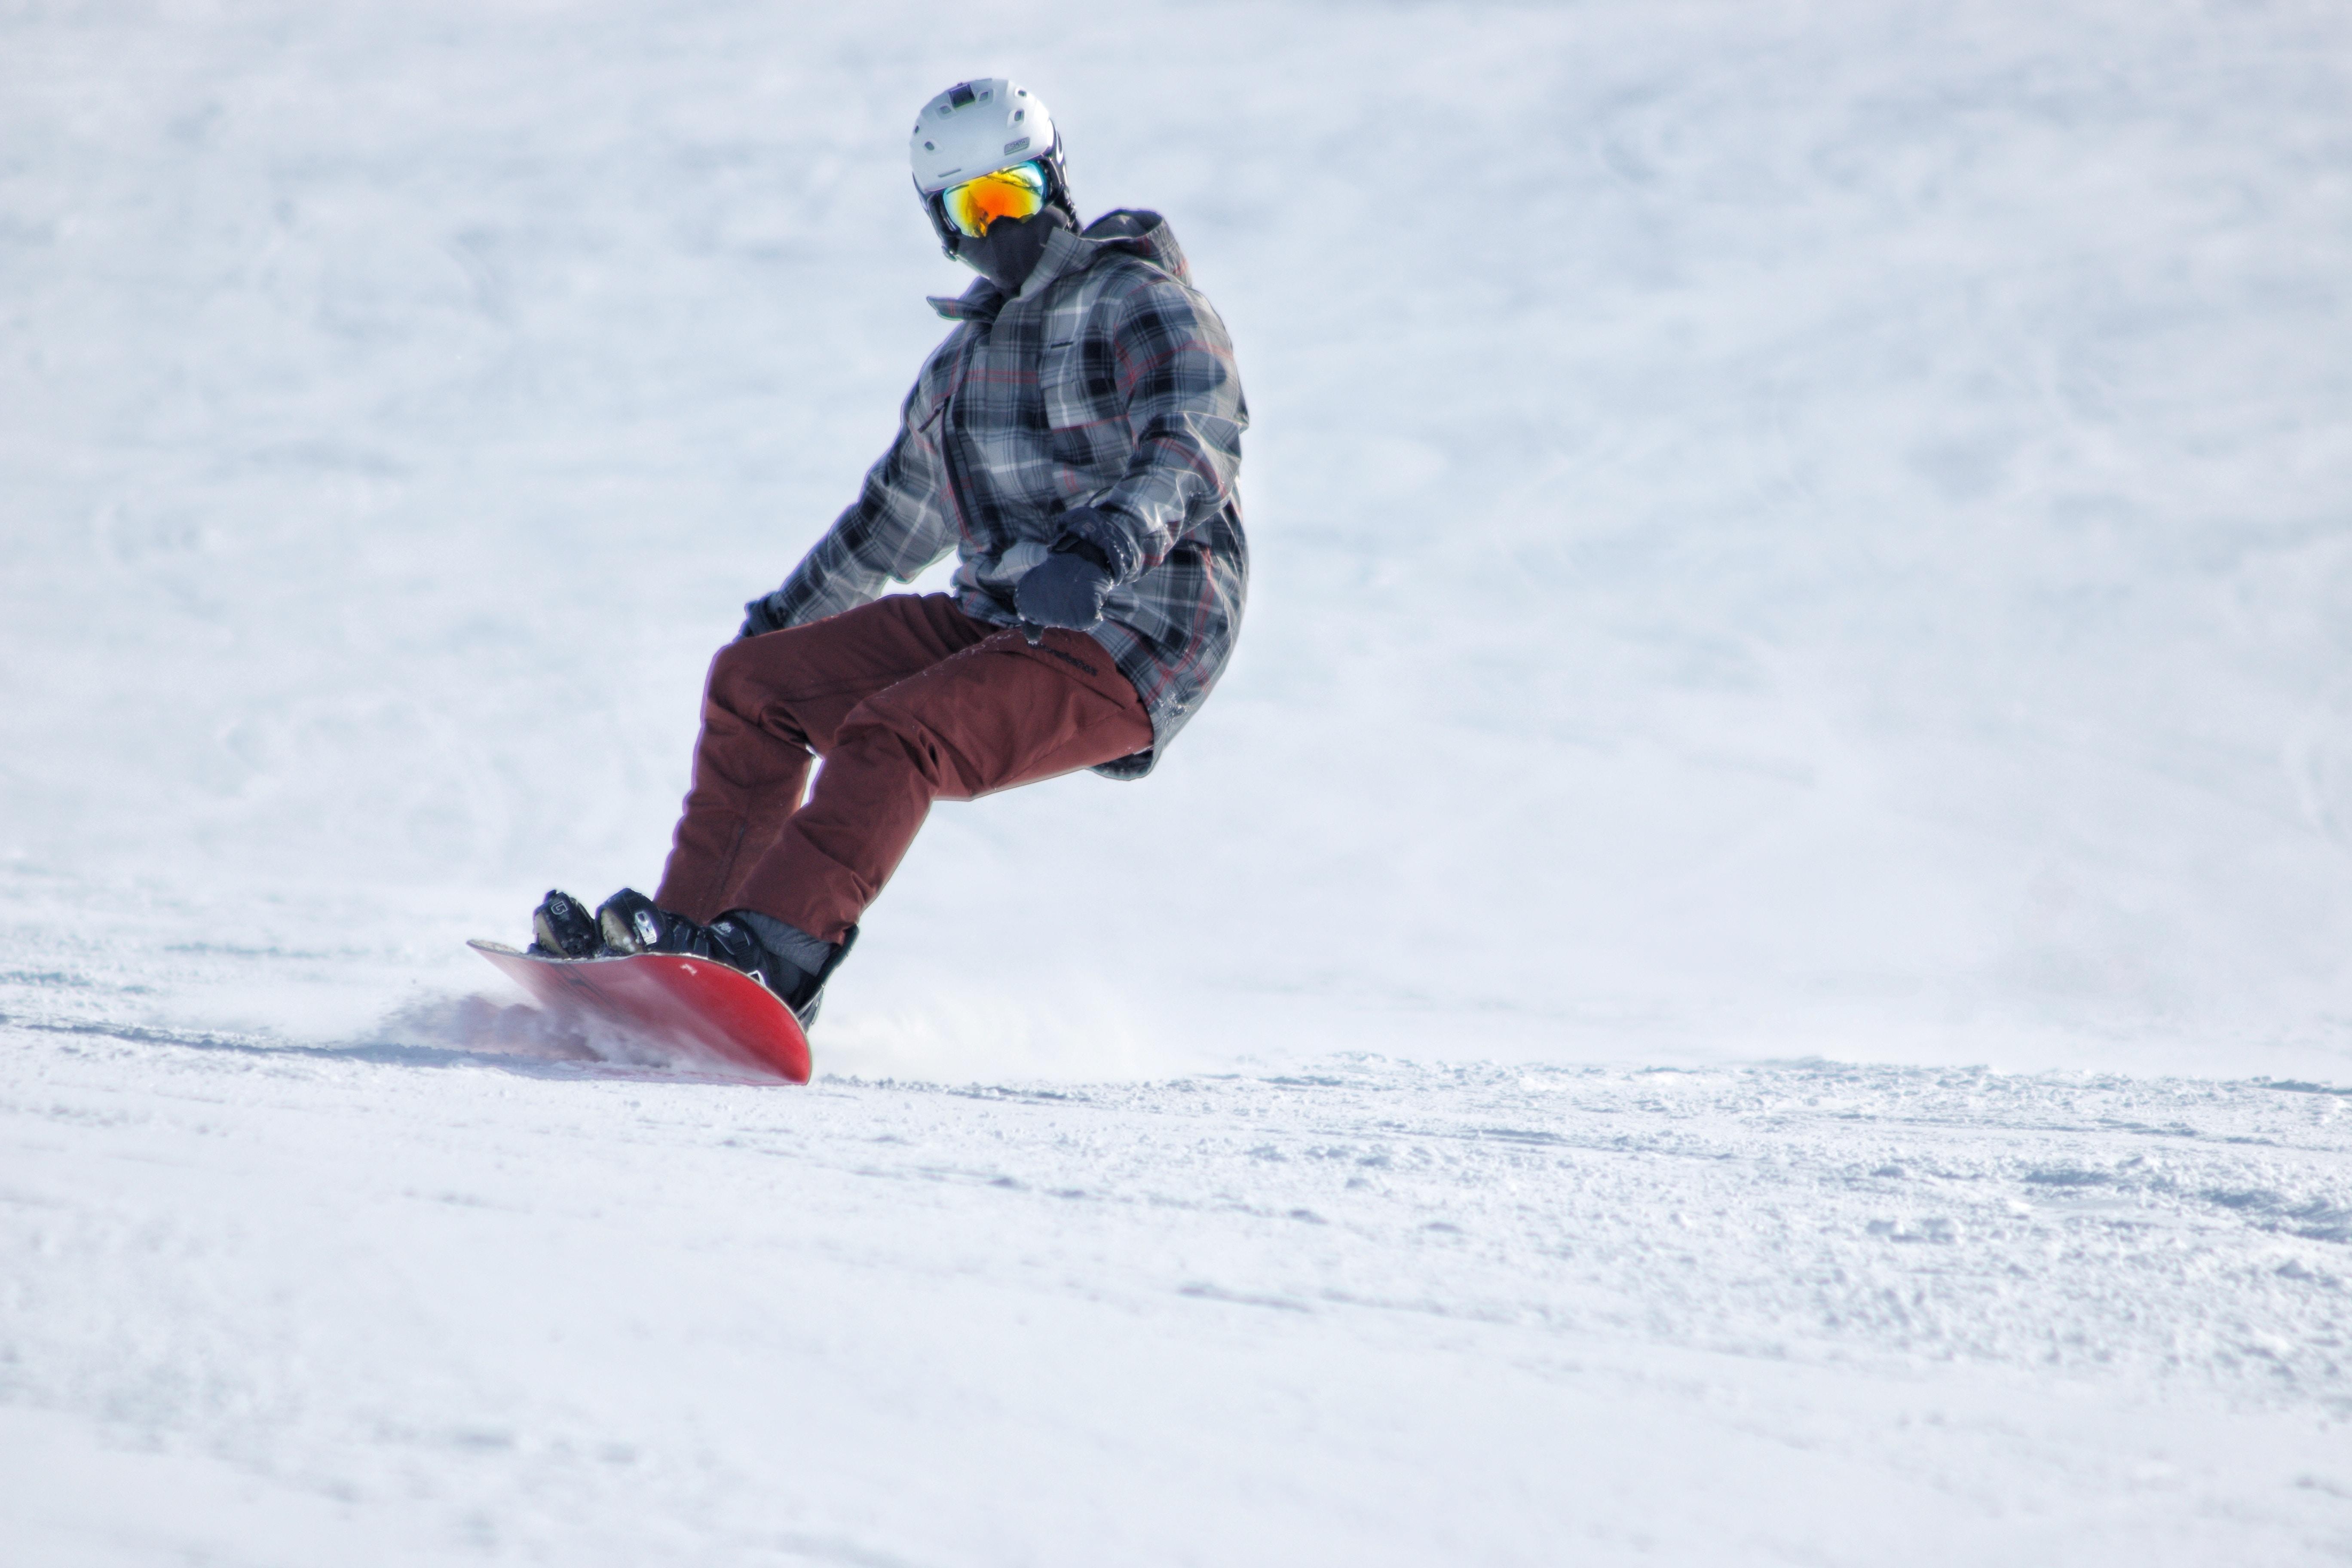 person snowboarding